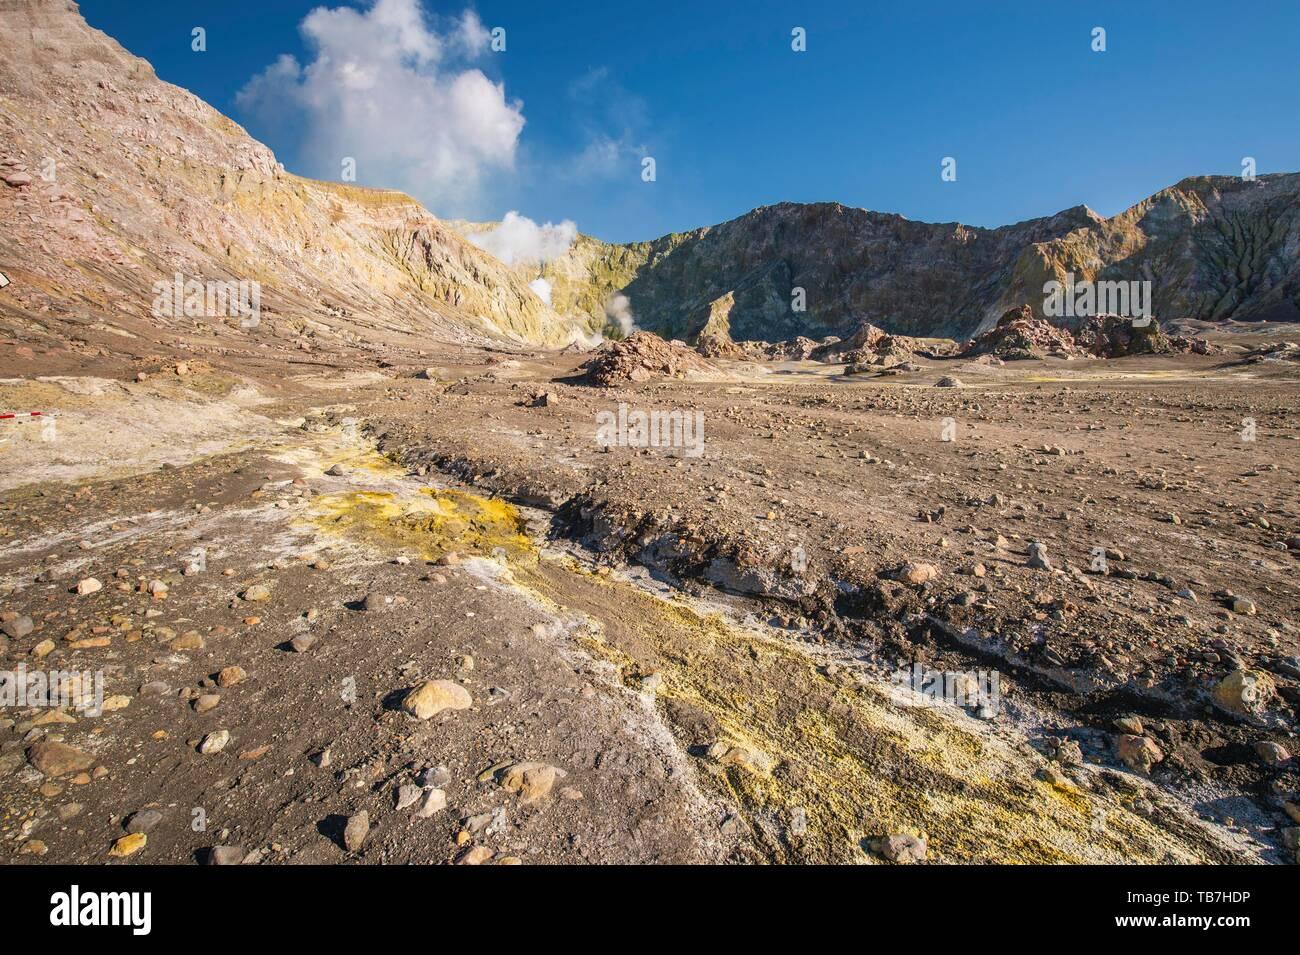 Rock formations, yellow sulphur and fumaroles on the volcanic island of White Island, Whakaari, Bay of Plenty, North Island, New Zealand - Stock Image